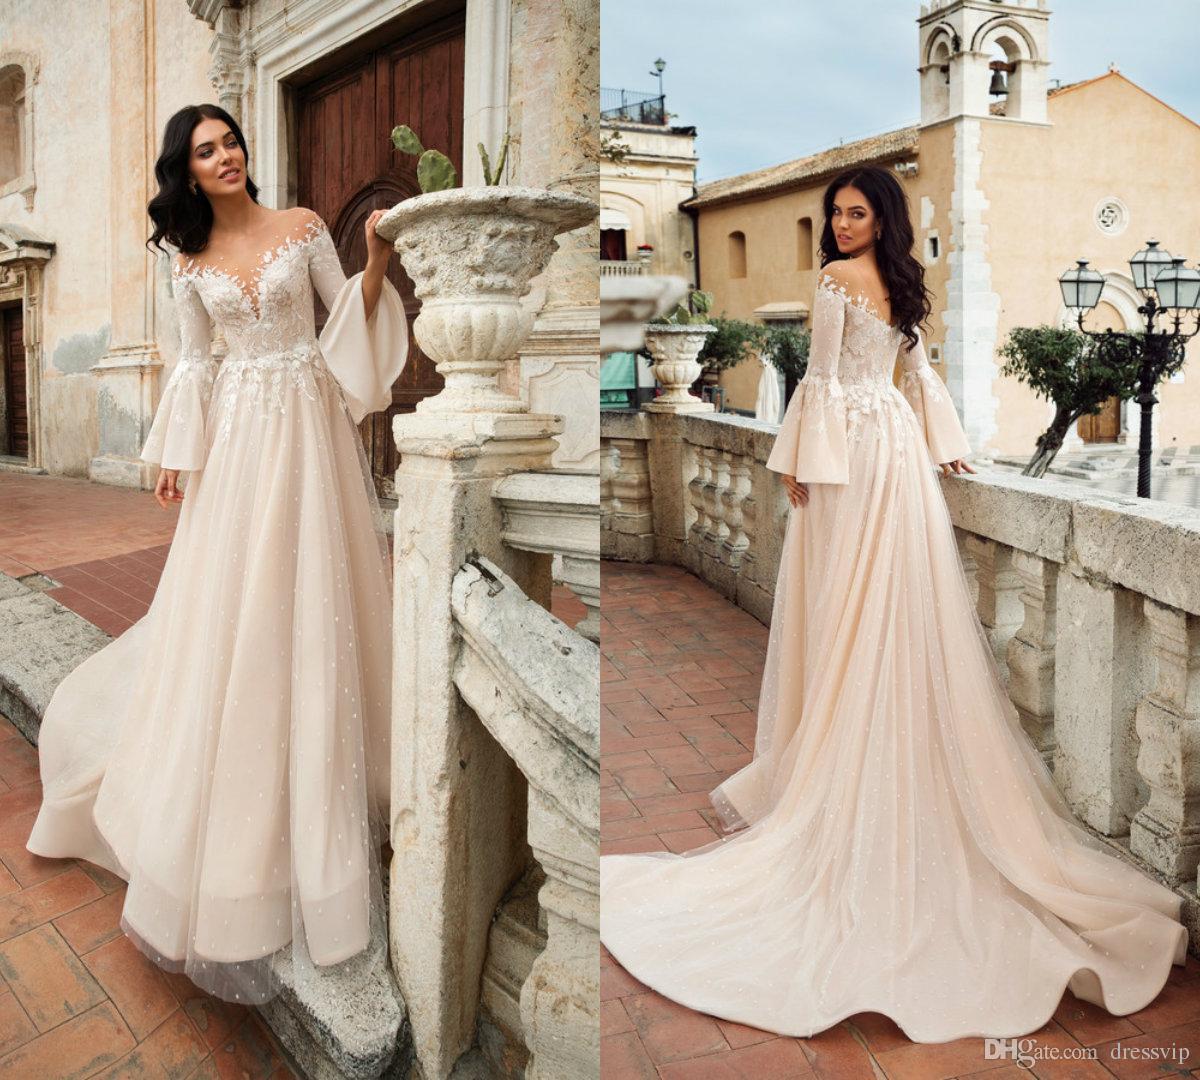 2018 Beach Wedding Dresses Sheer Jewel Neck Lace Applique Long Sleeve Boho  Bridal Dress Sweep Train Elegant Plus Size Wedding Gowns